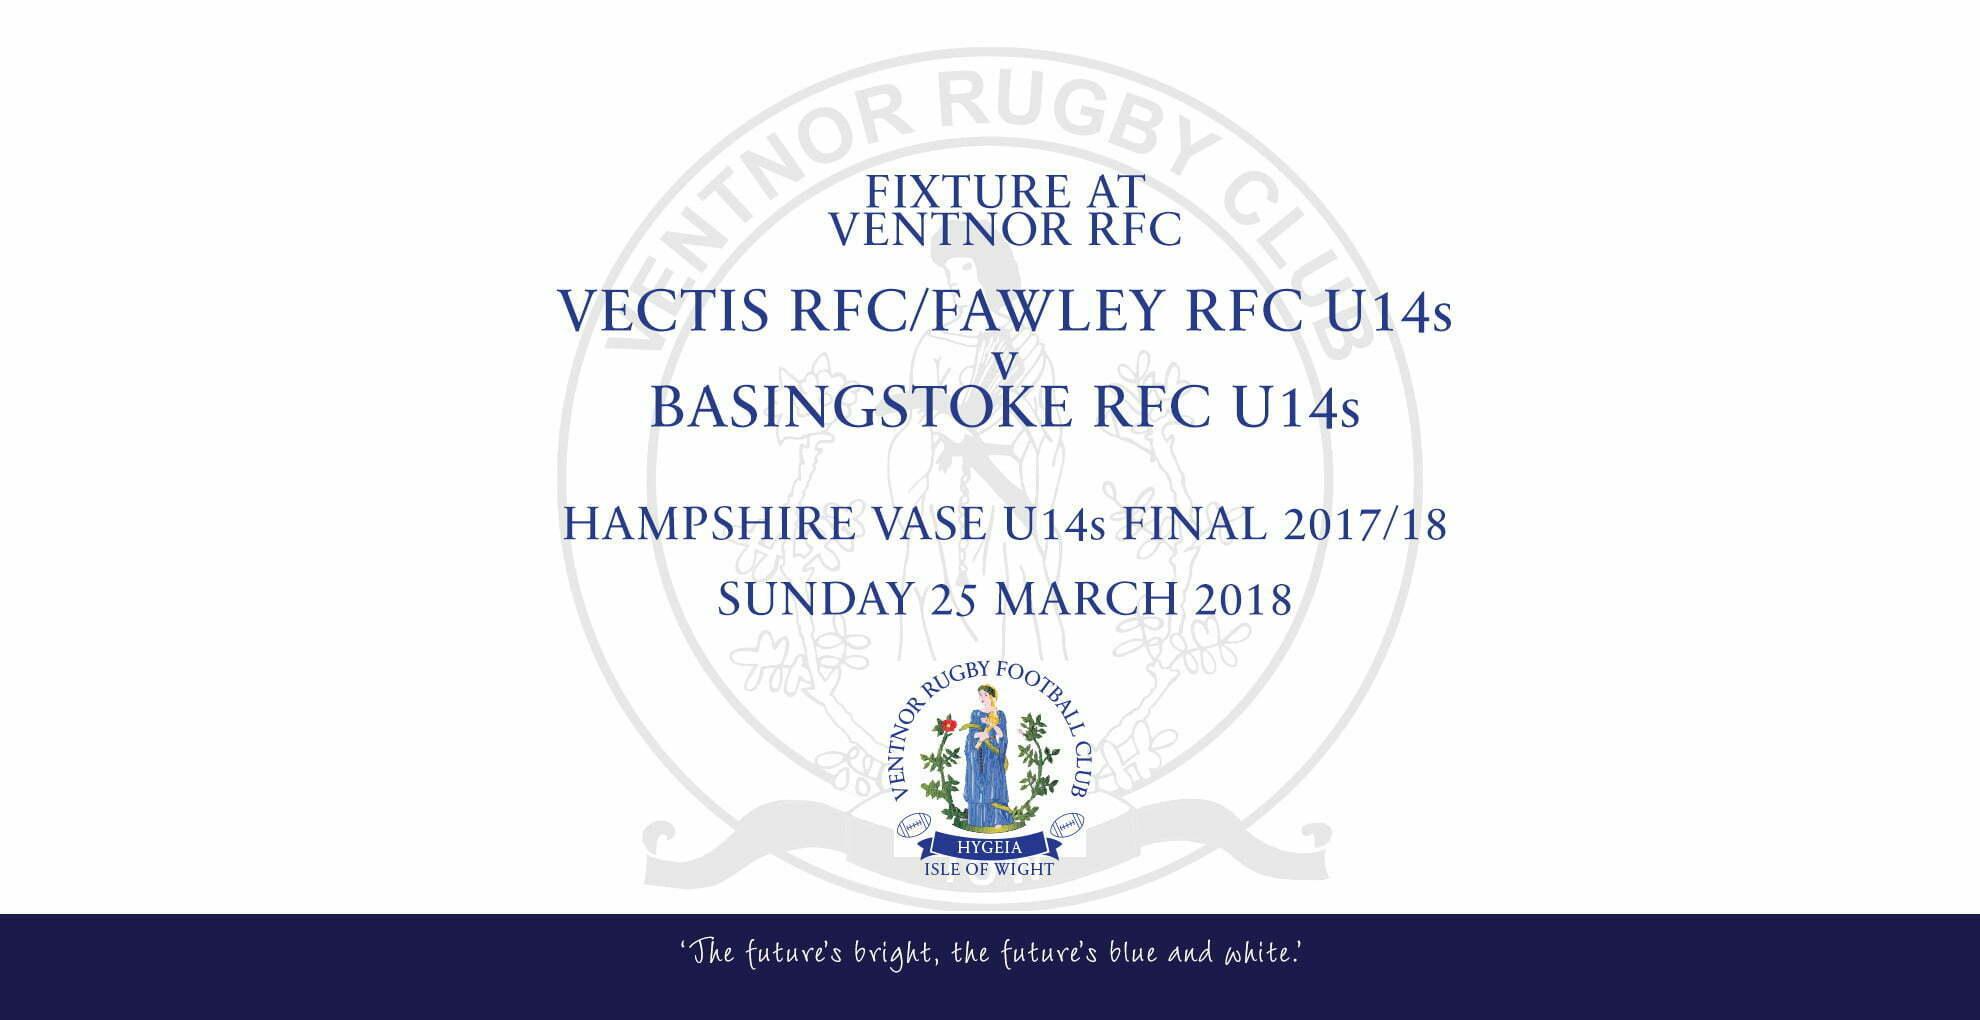 Hampshire VASE U14s Final 2017/18